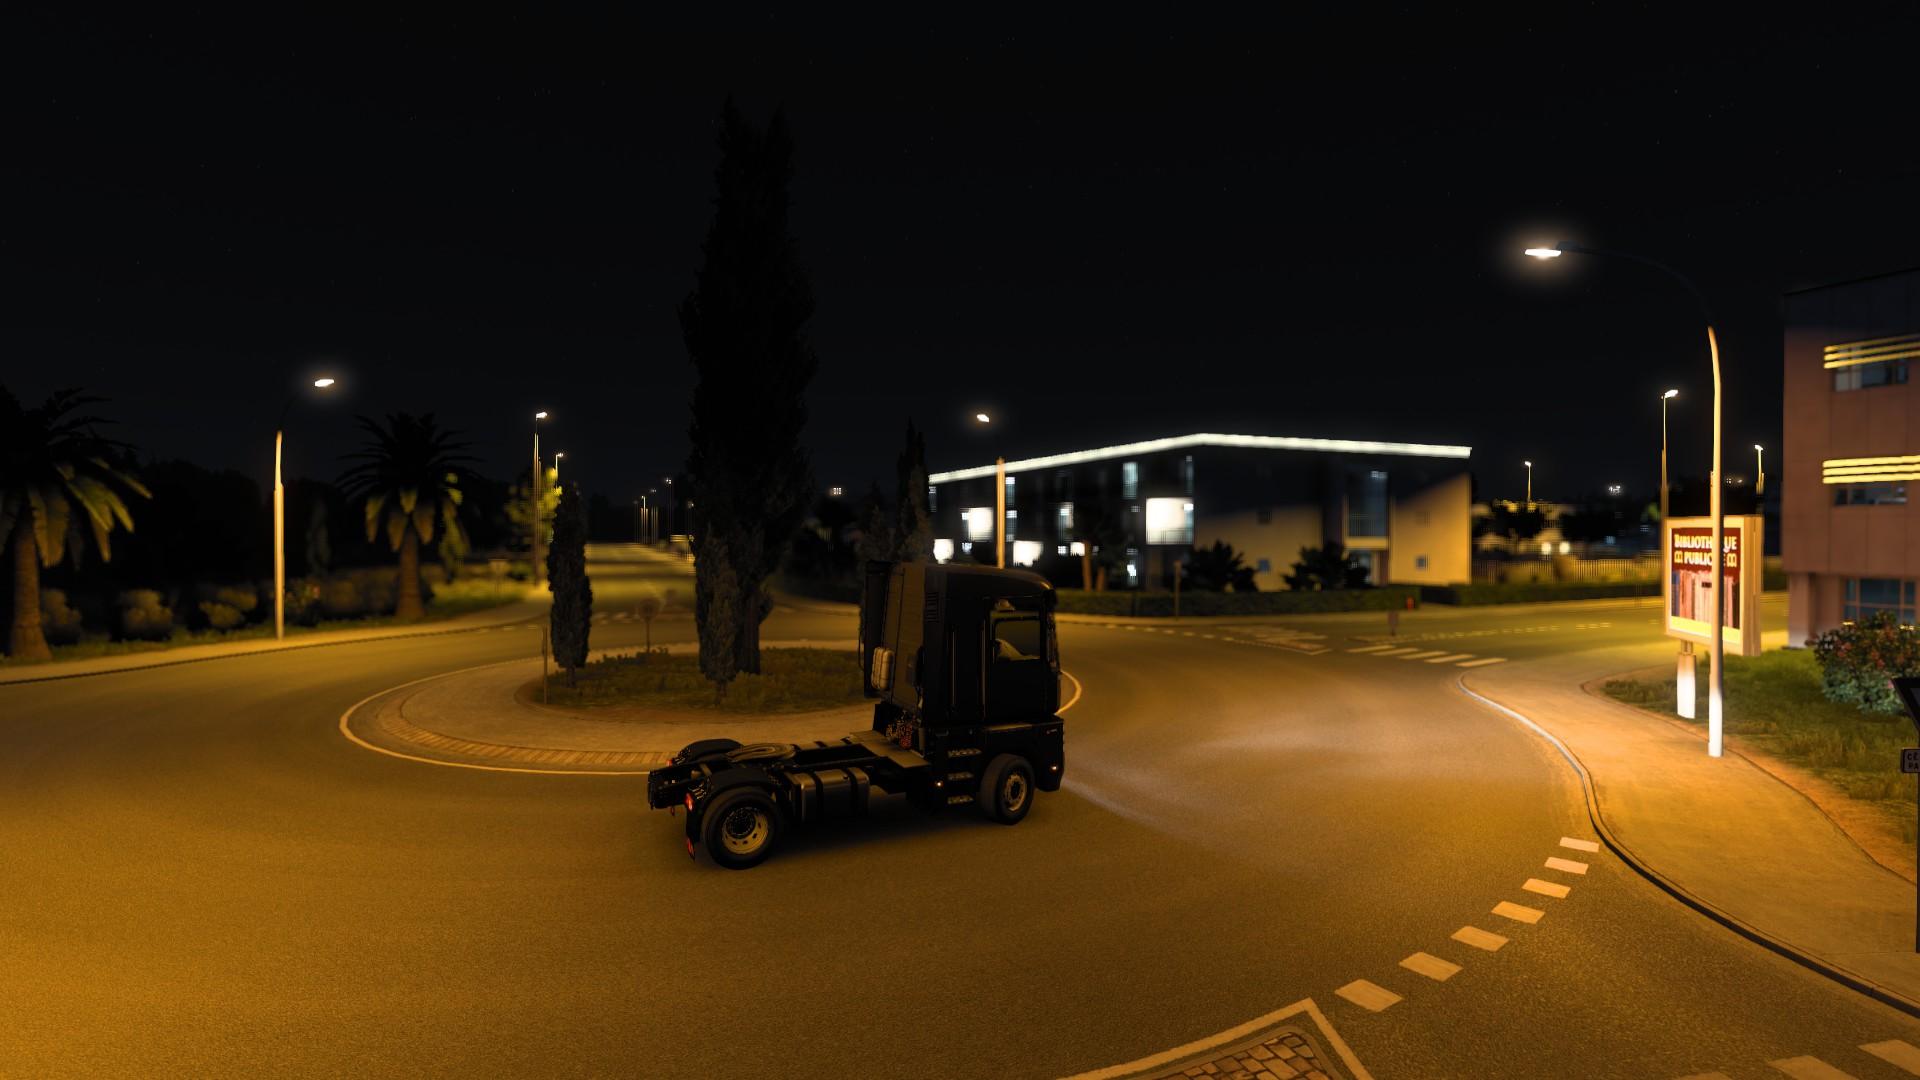 ETS 2 Update 1.40 Night Glow